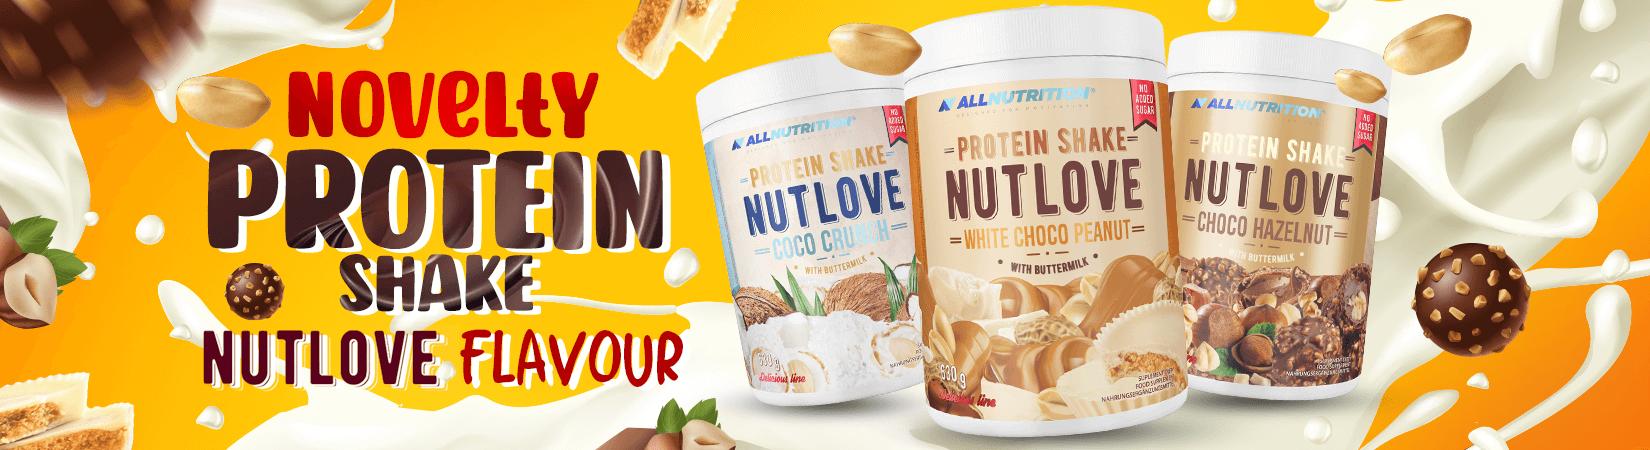 Allnutrition Nutlove Protein Shake Uk